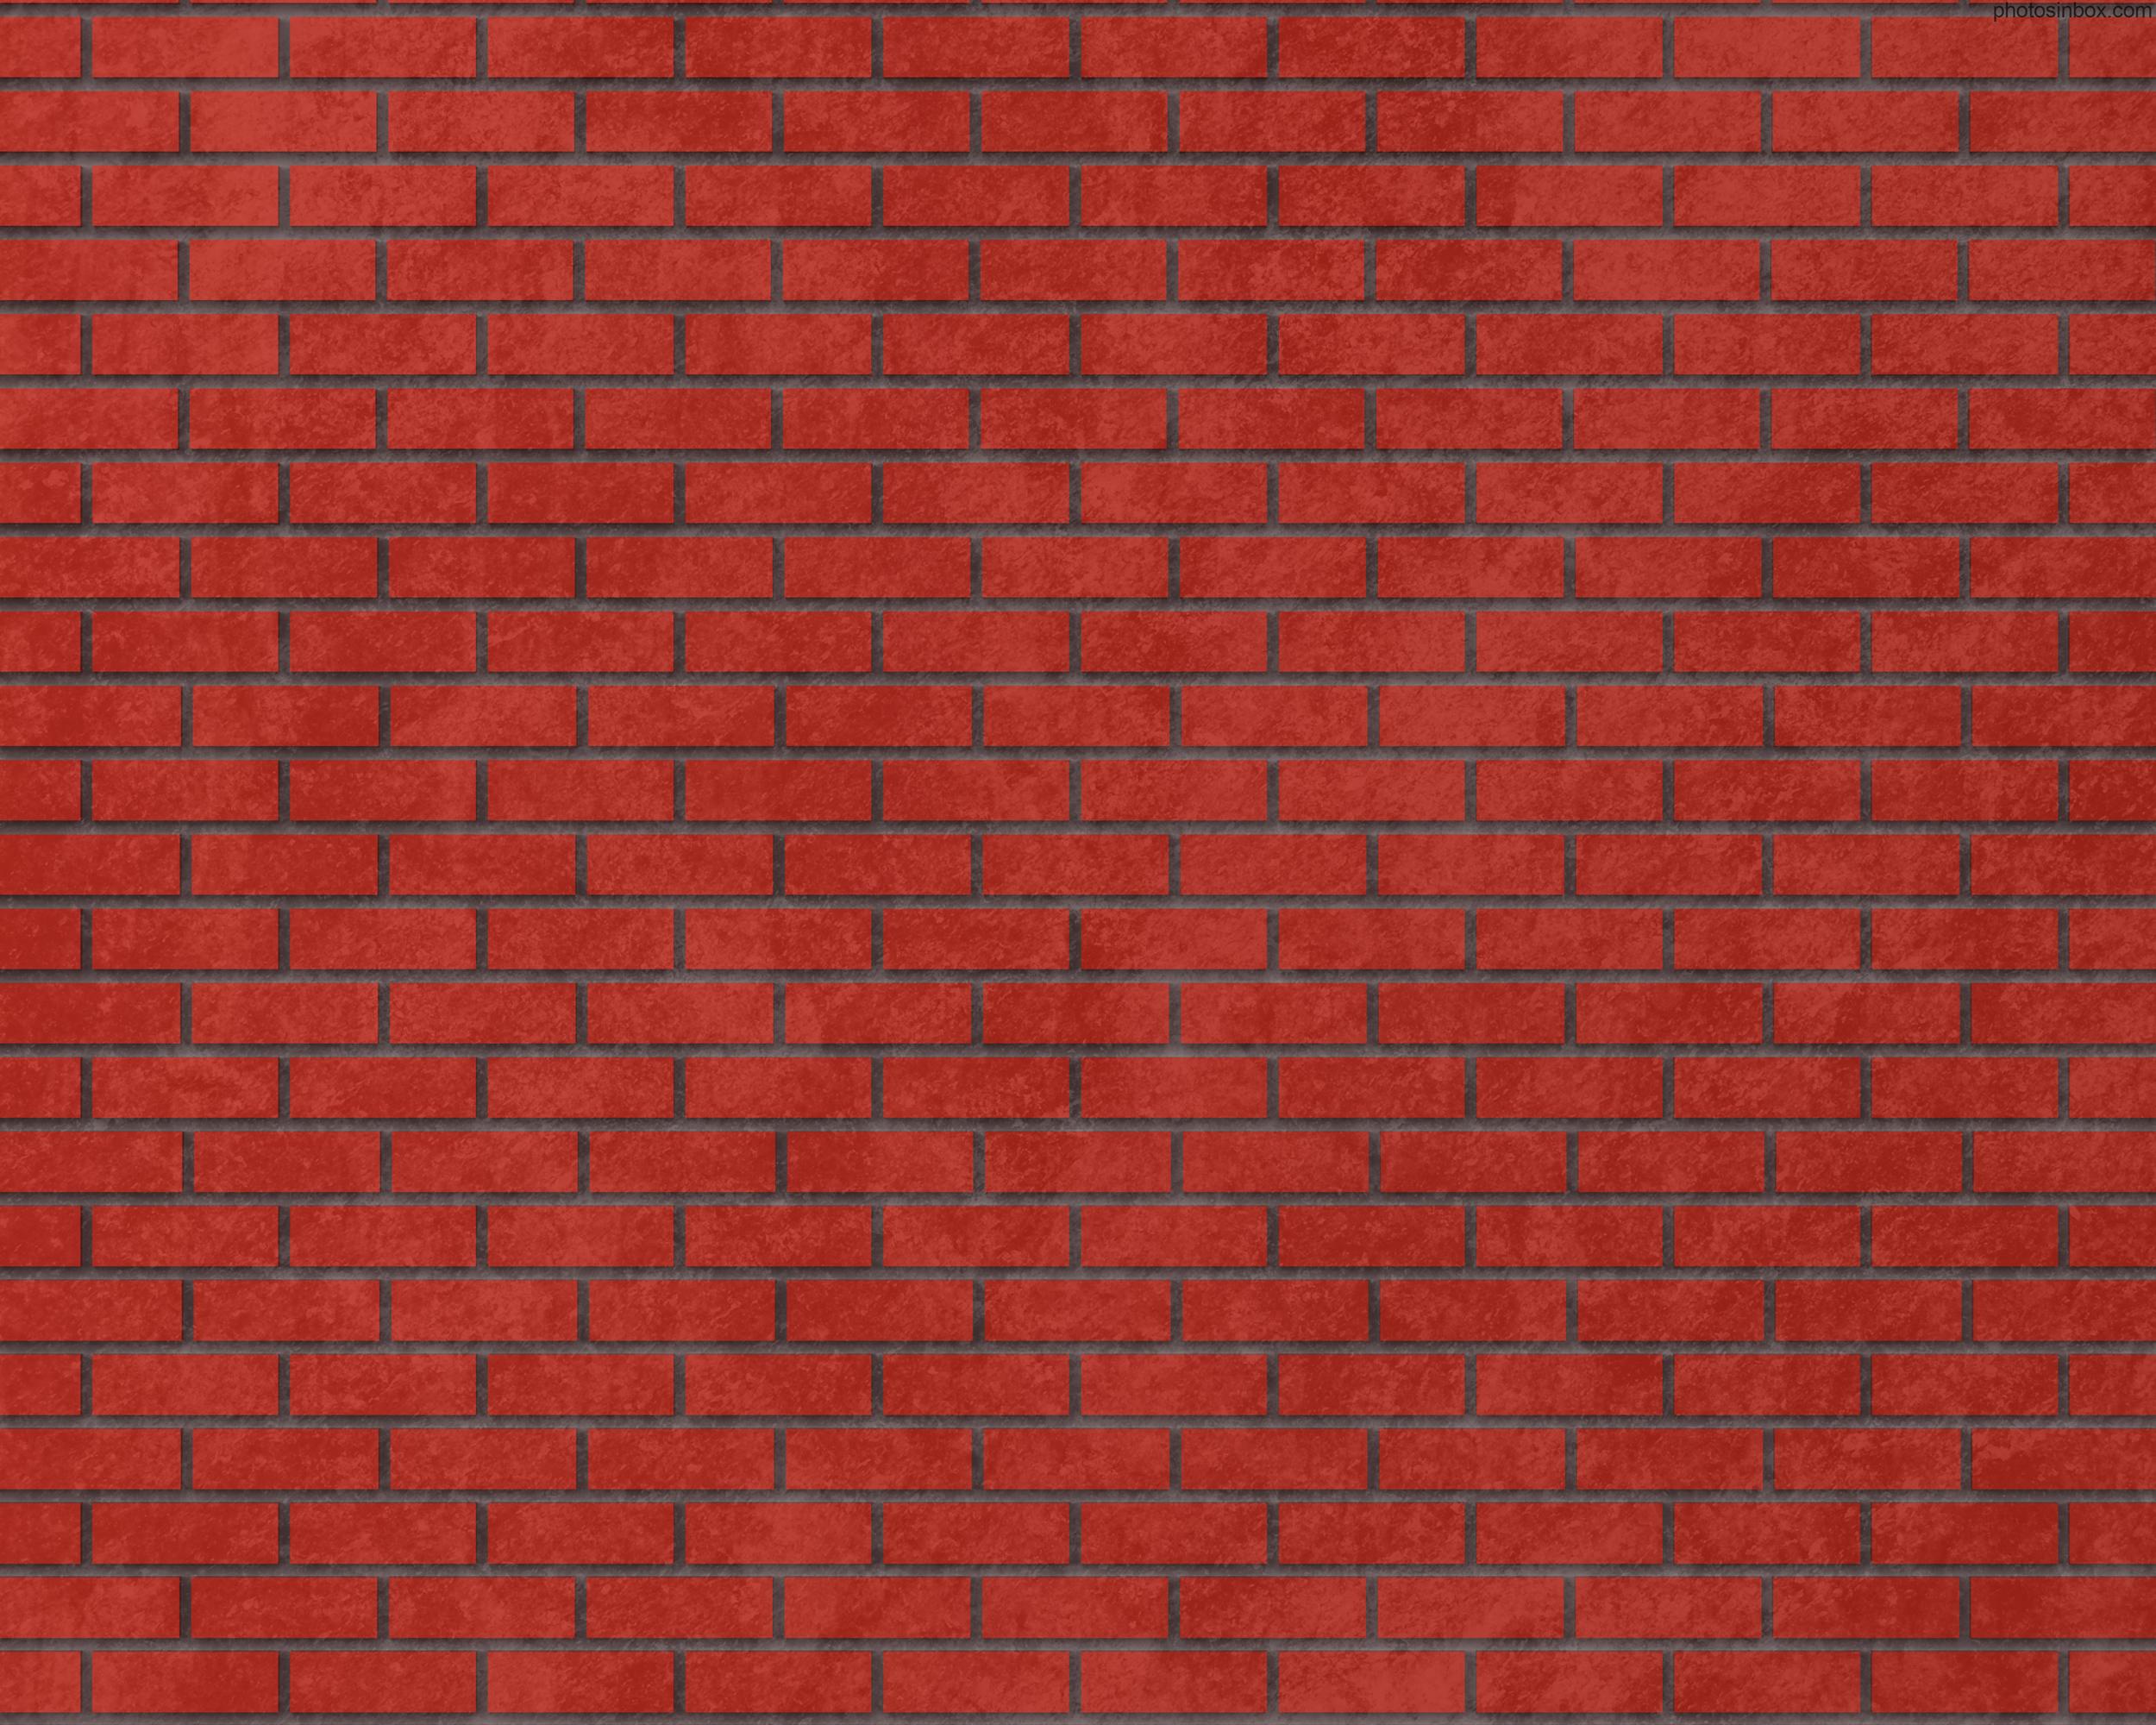 red brick wall, texture, red bricks, brick wall texture, background, download